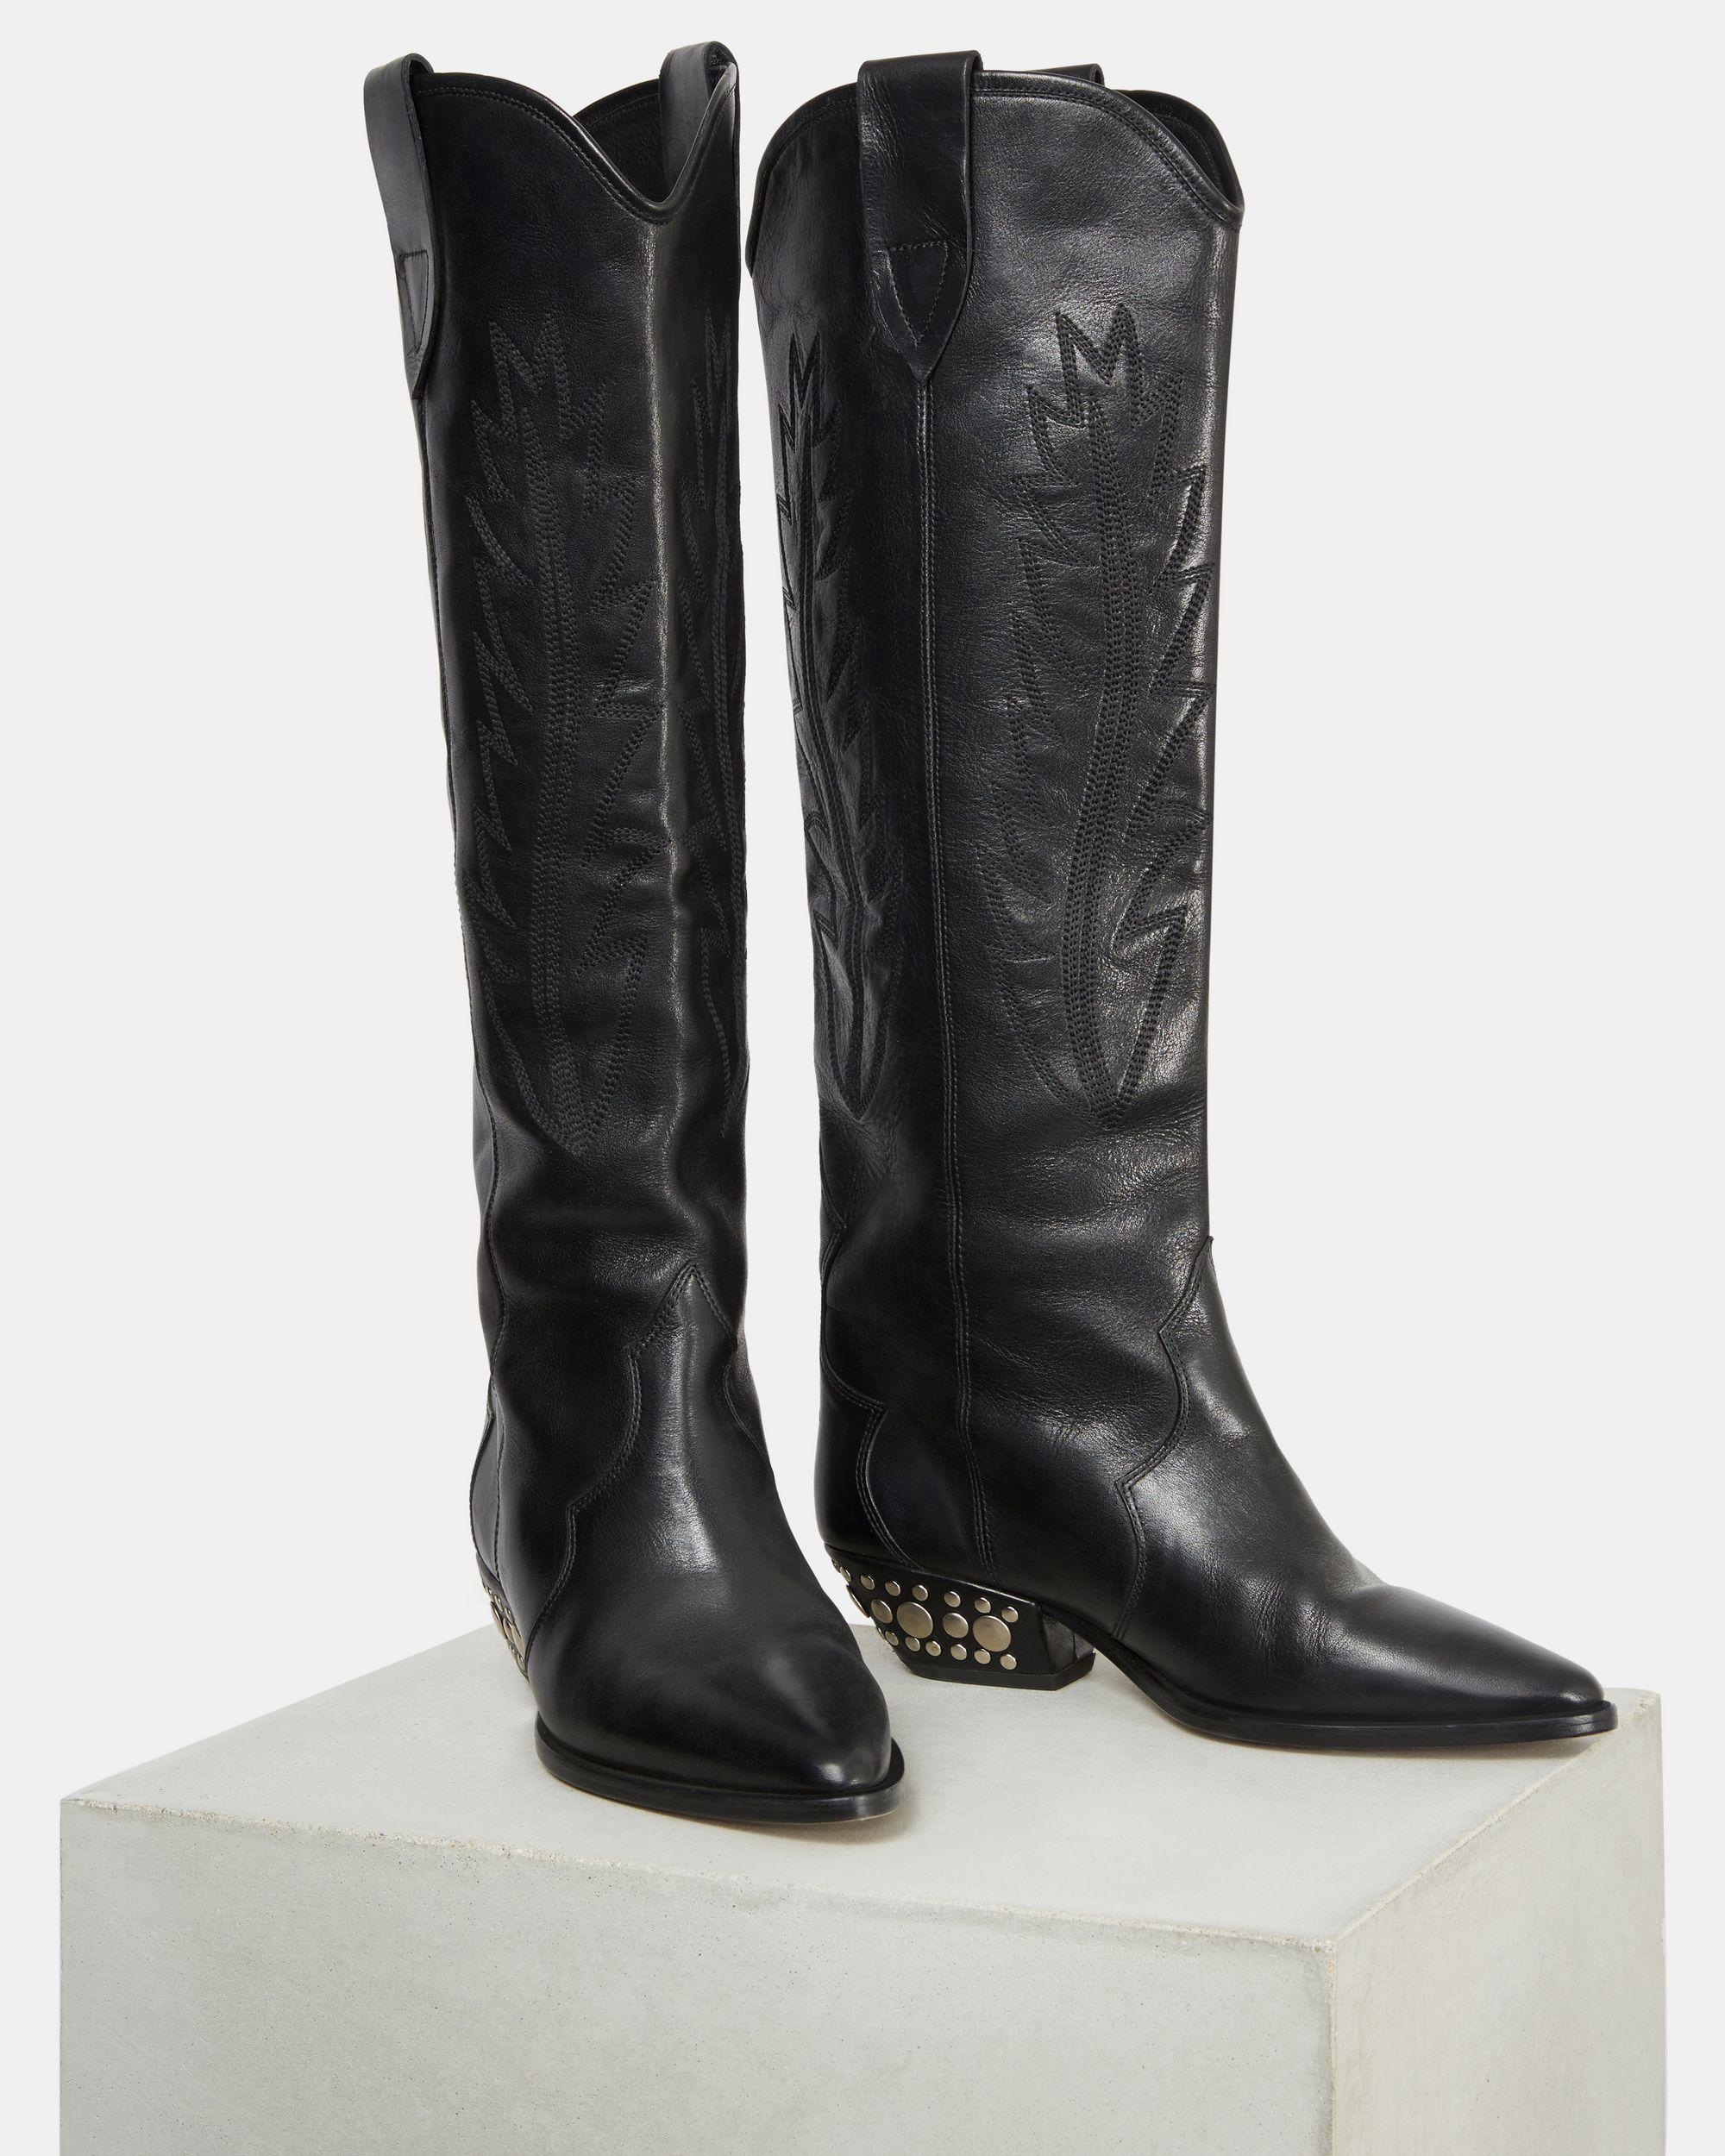 ca0db1d3c54 DINZI boots ISABEL MARANT | favorite shoes